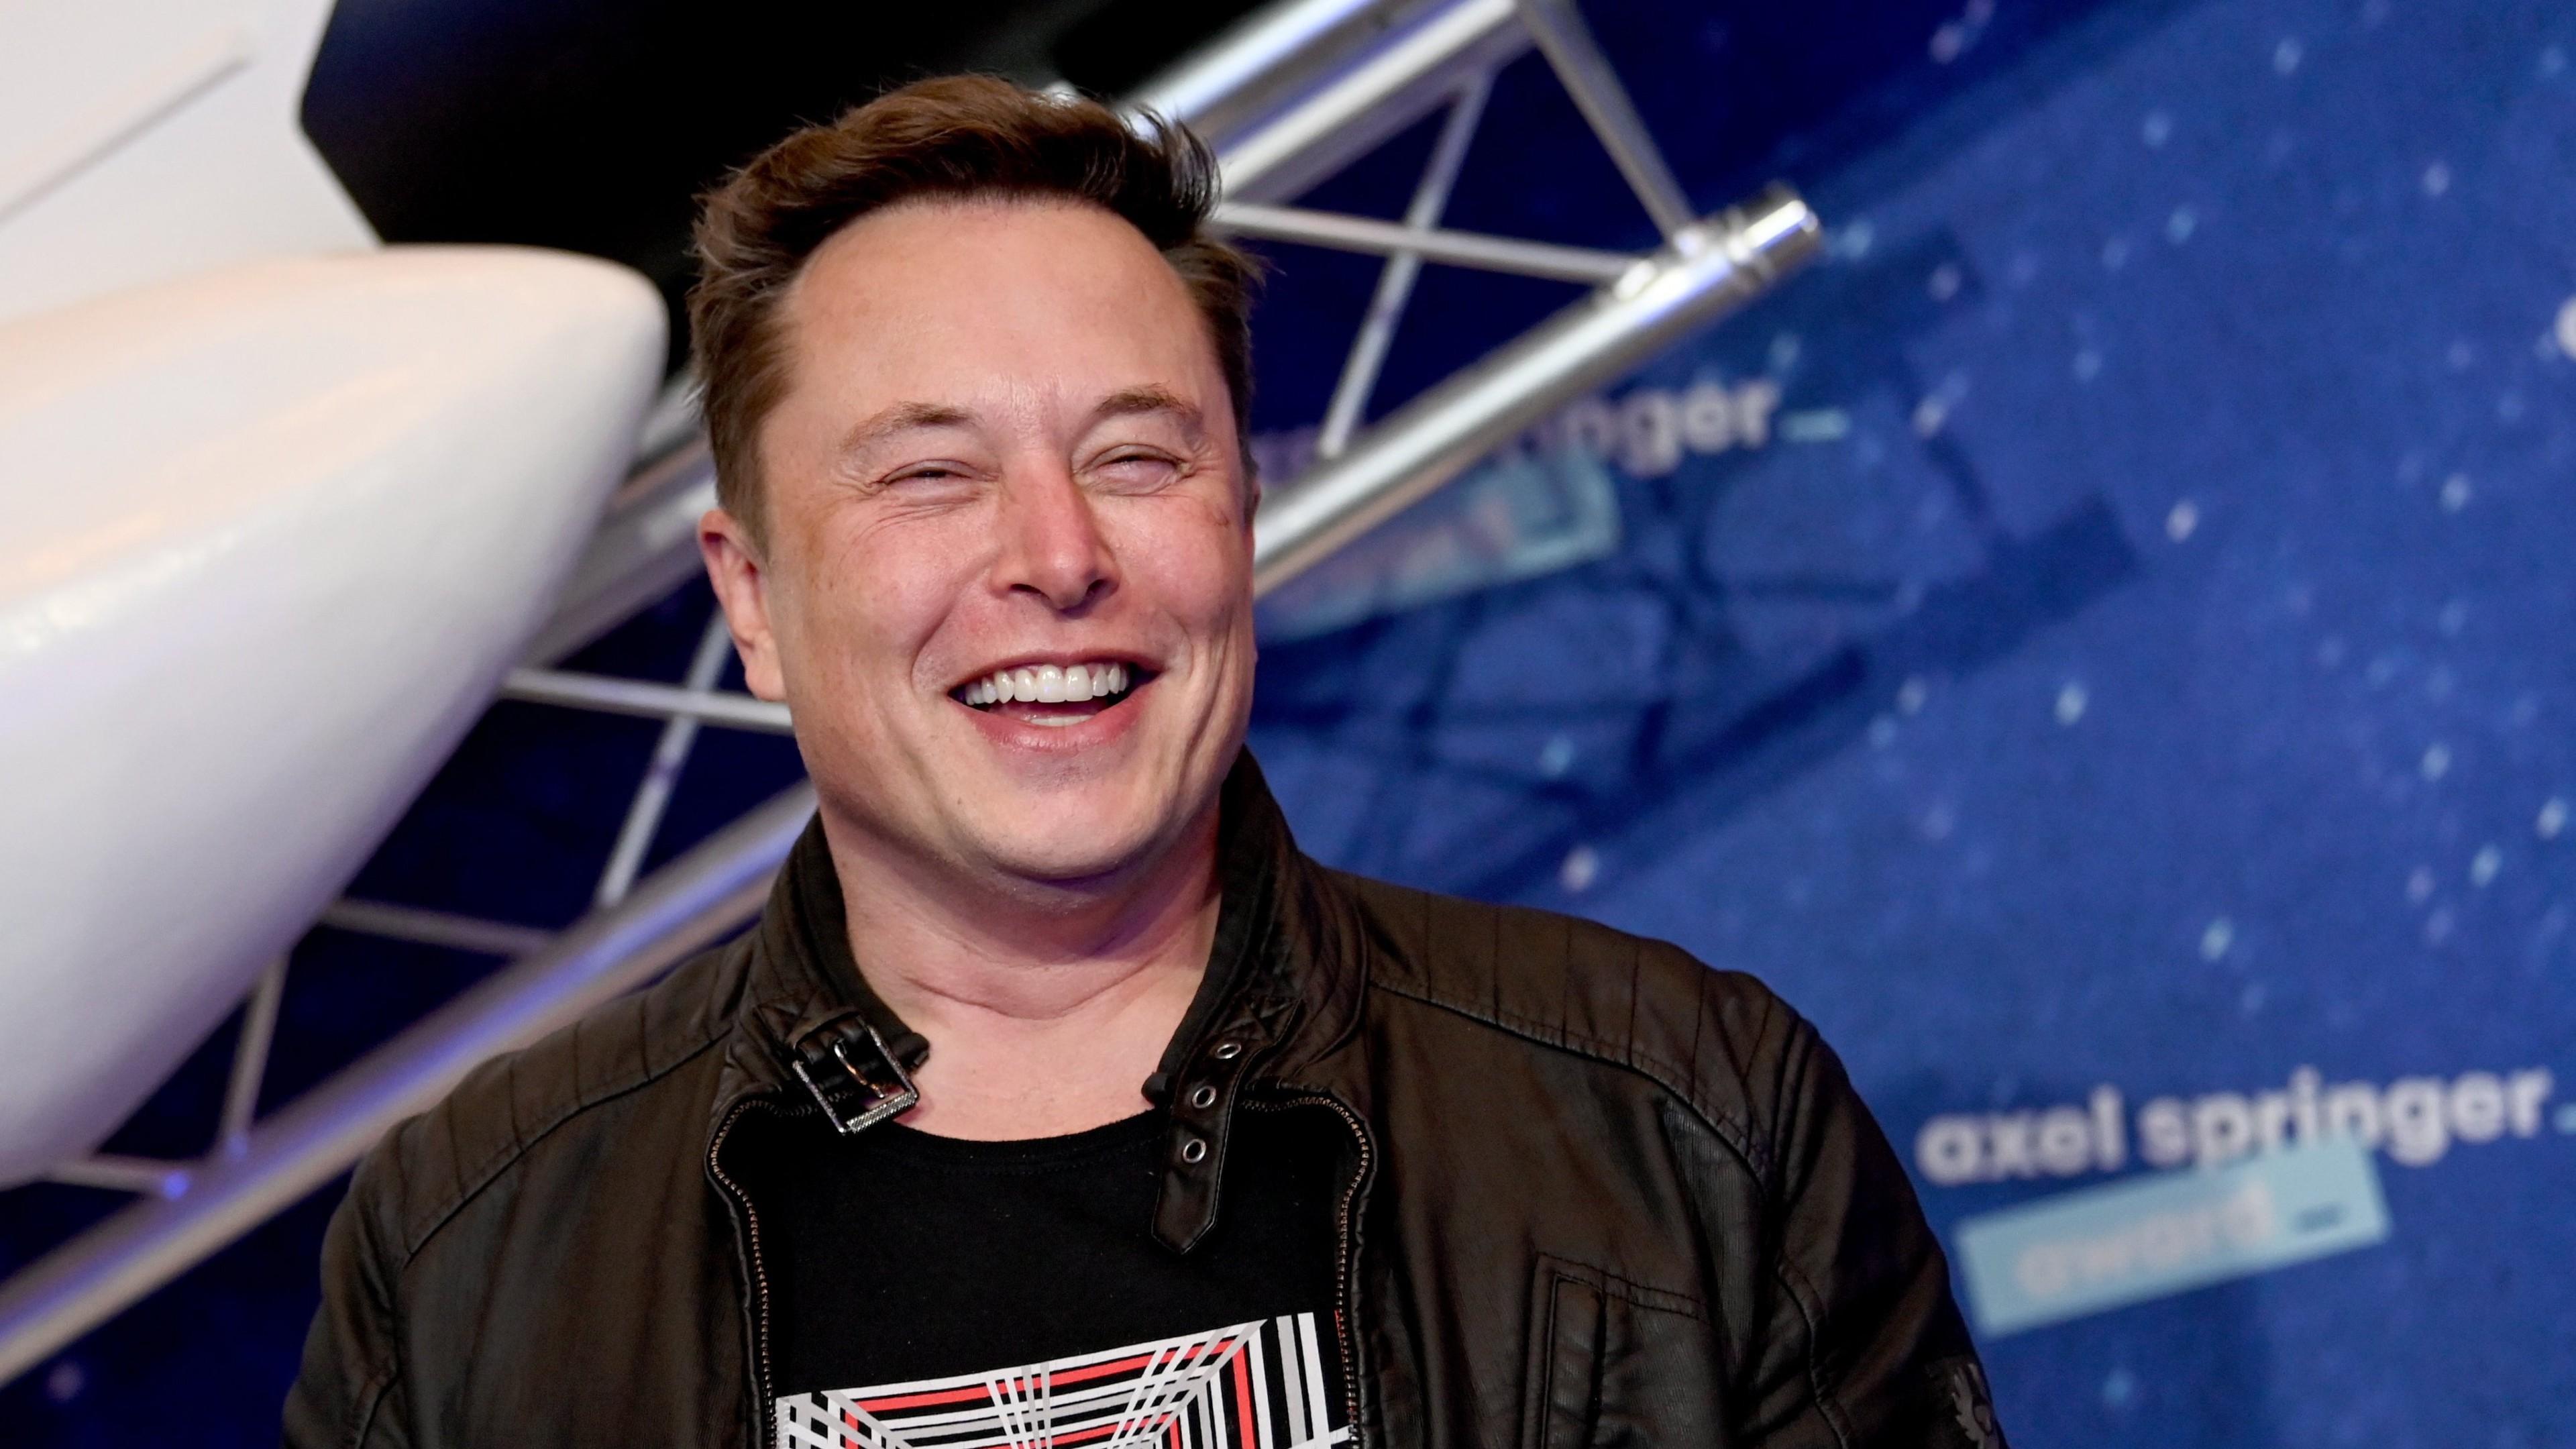 Bitcoin schiet omhoog na Lord of The Rings-tweet van Elon Musk - Manners Magazine